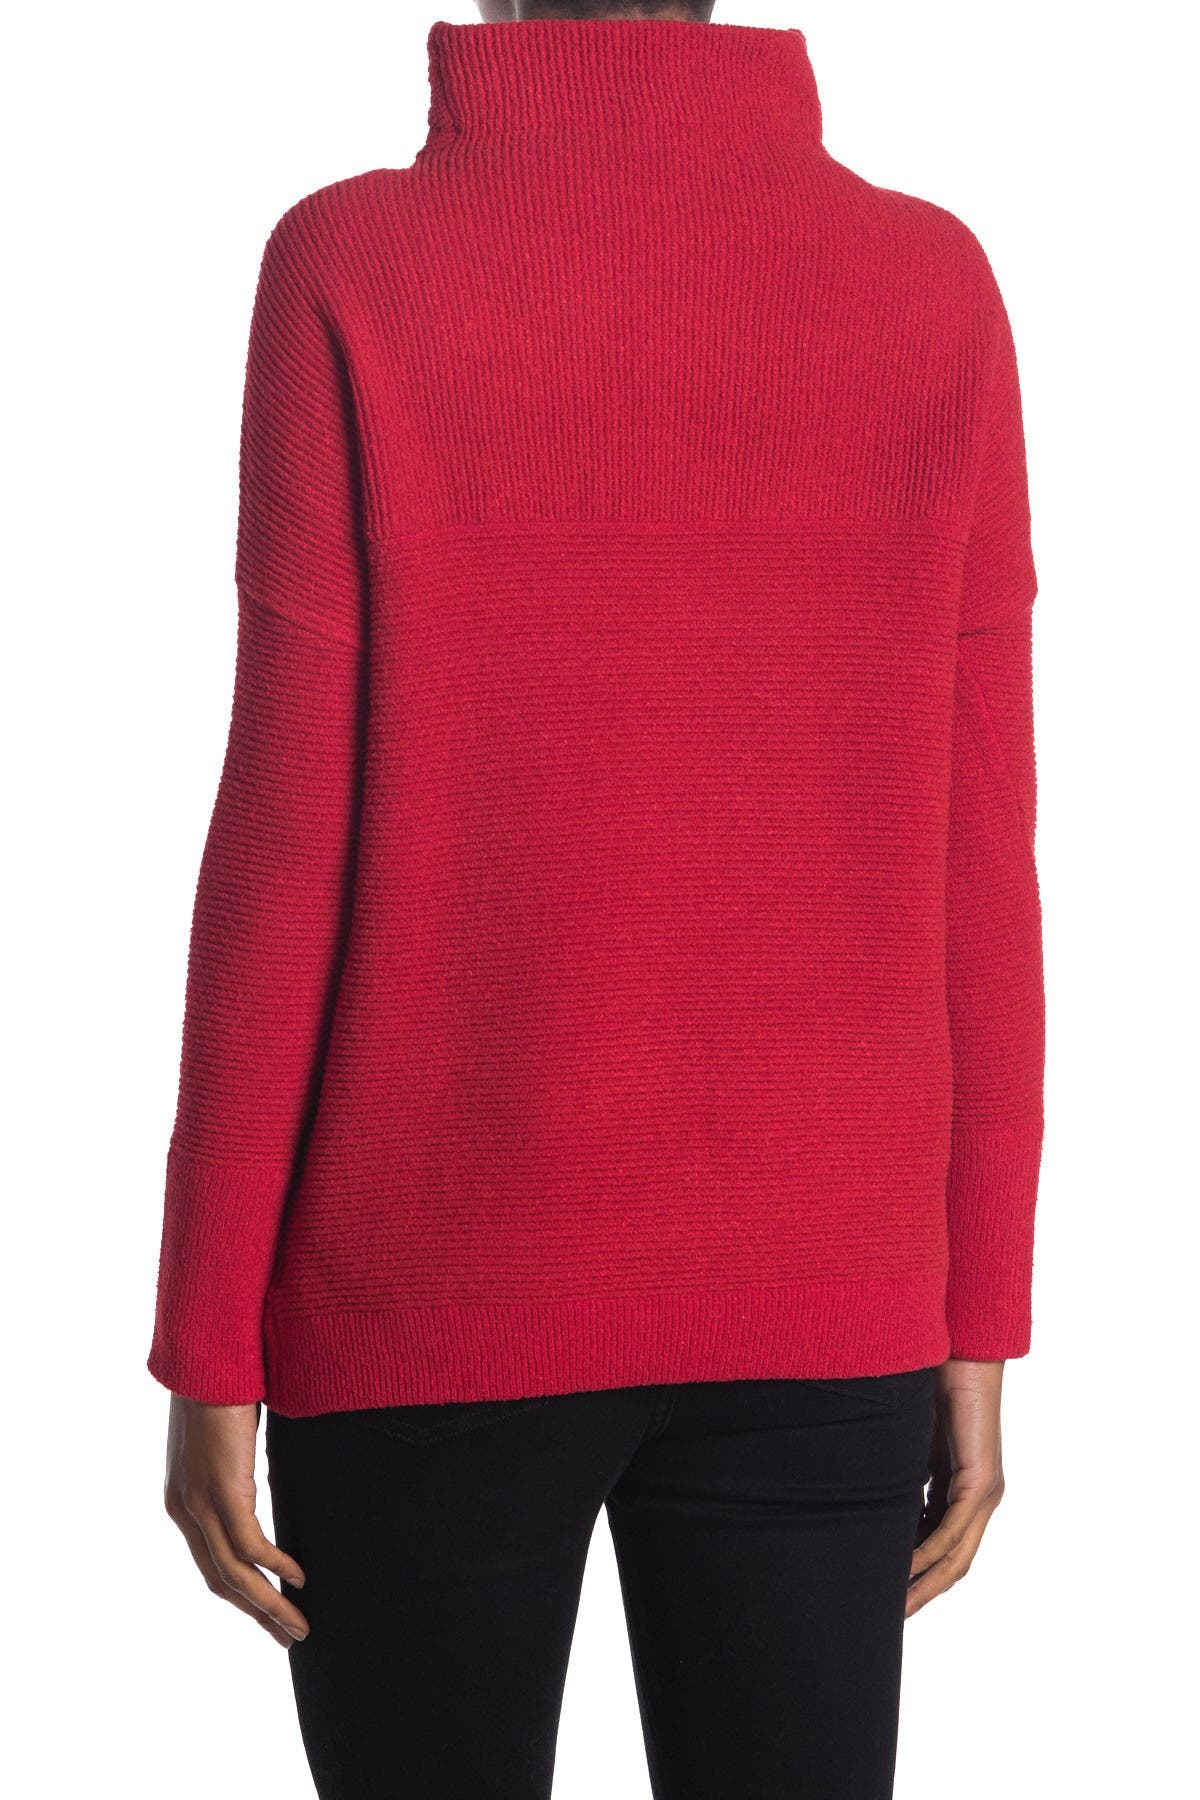 Image of Modern Designer Cozy Mock Neck Dolman Pullover Sweater